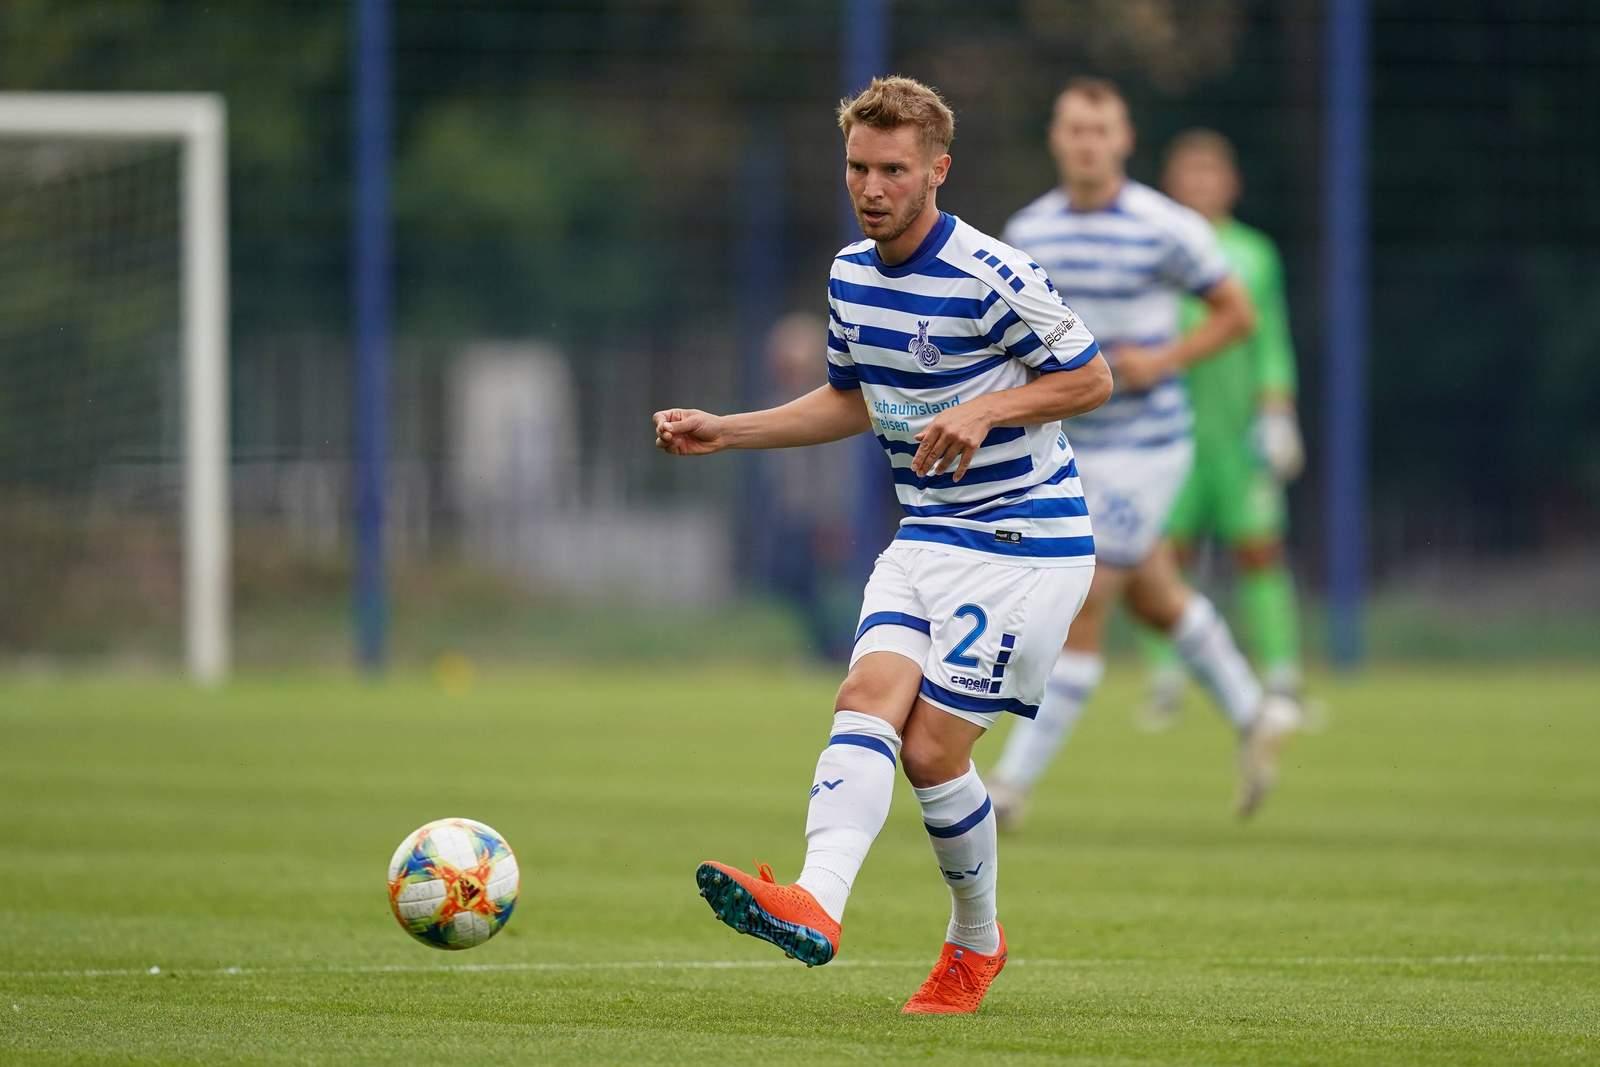 Florian Brügmann im Test gegen ASC Dortmund.